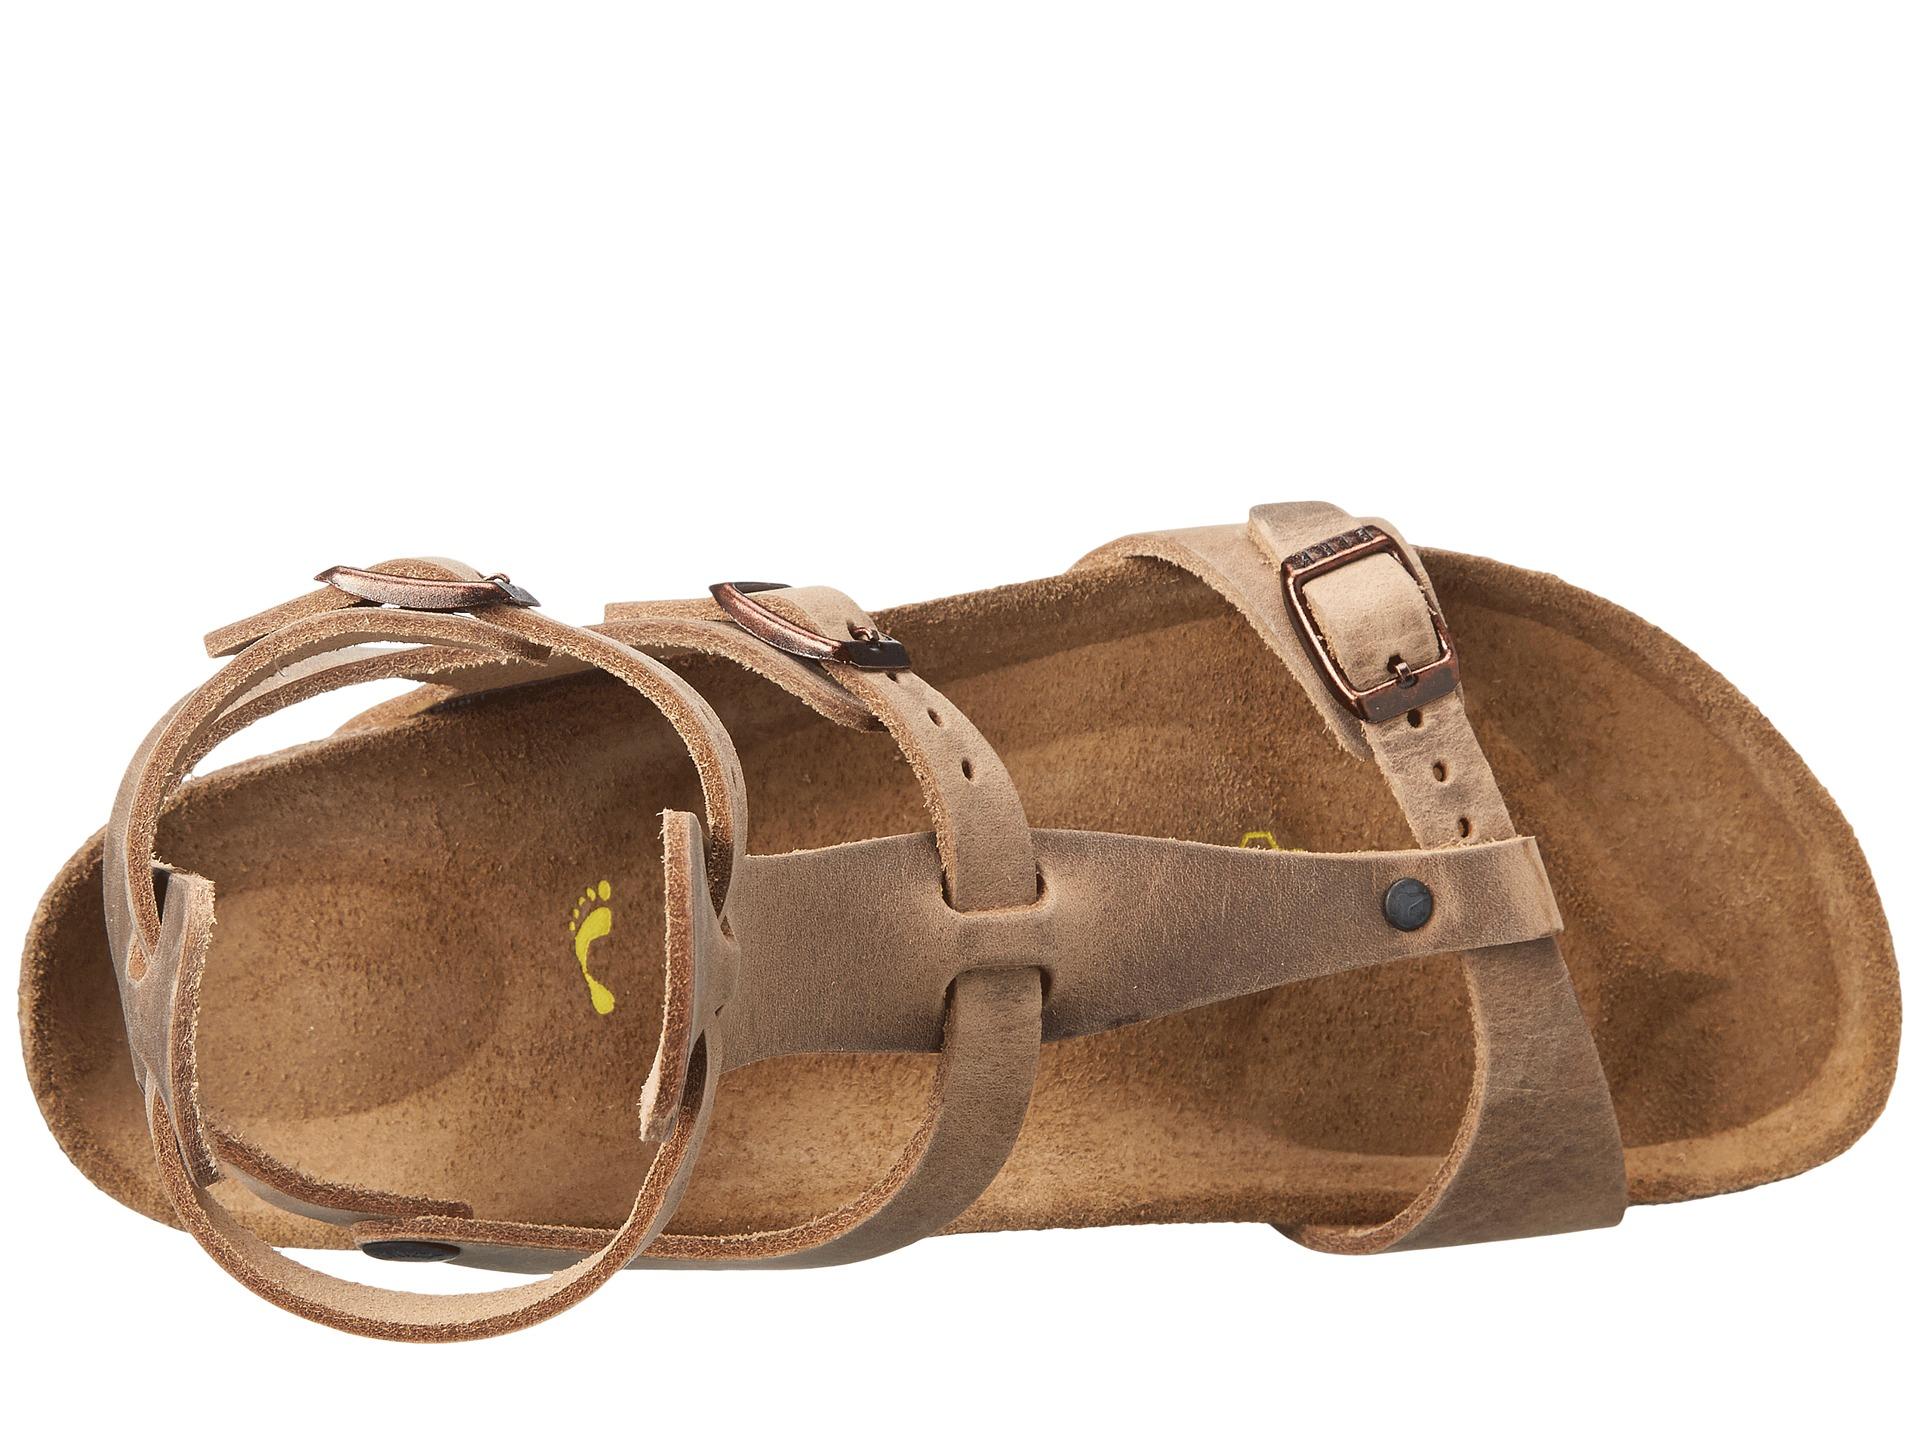 bd497e5bf1b1 Mens Birkenstock Eva Madrid Betula Shoes